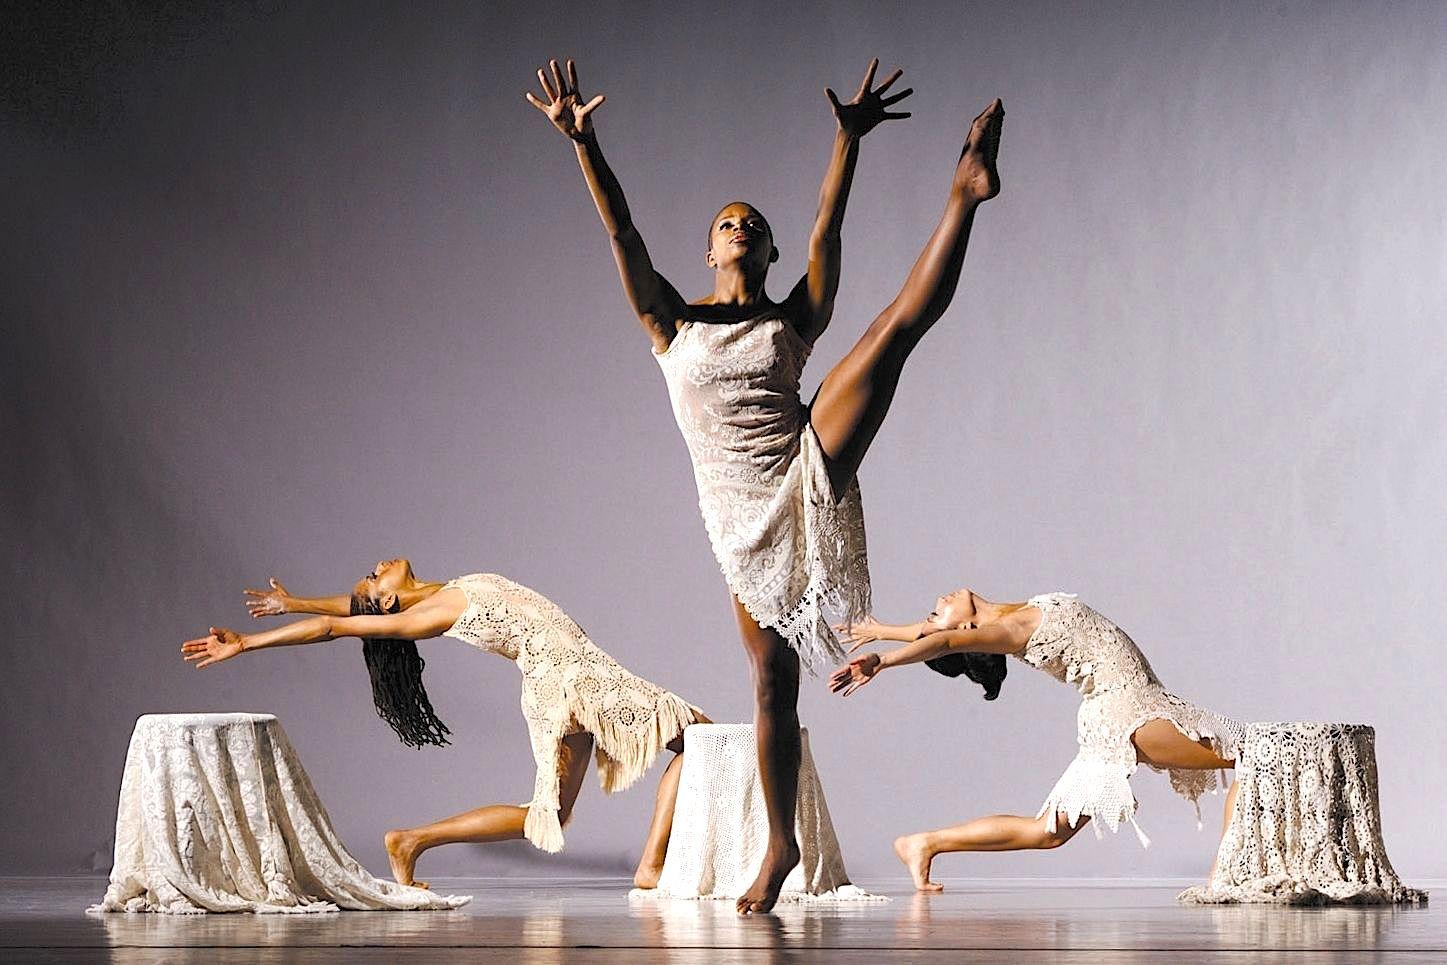 Alvin Ailey, Alvin Ailey II, African American Dance, KOLUMN Magazine, KOLUMN